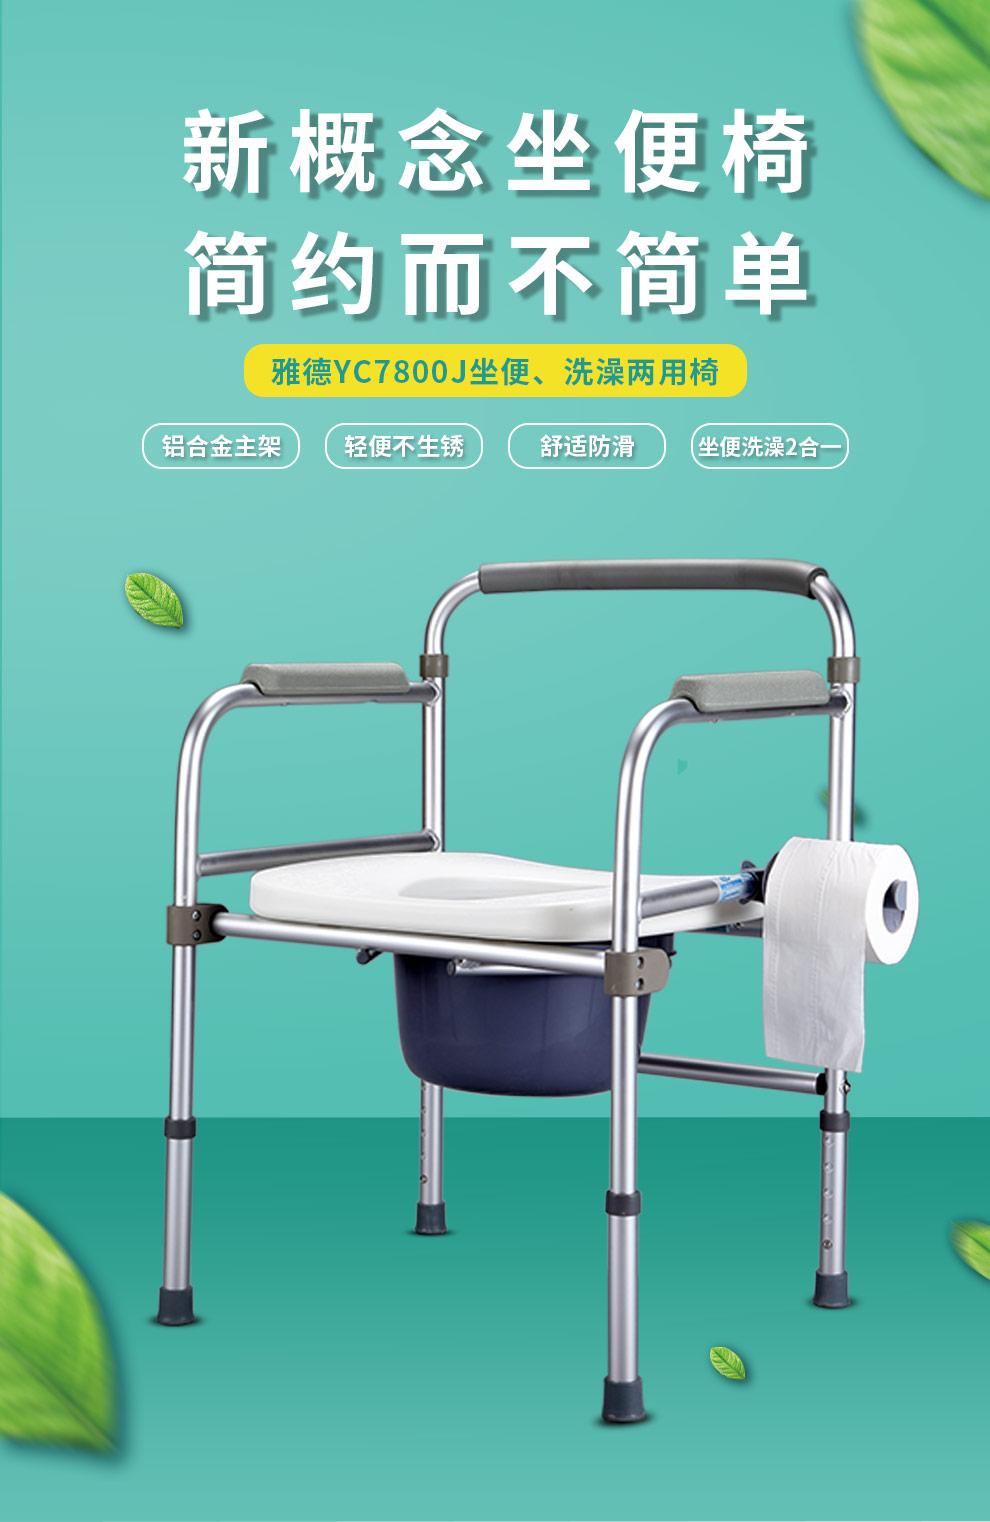 Yade old toilet seat aluminum alloy foldable toilet old toilet seat ...